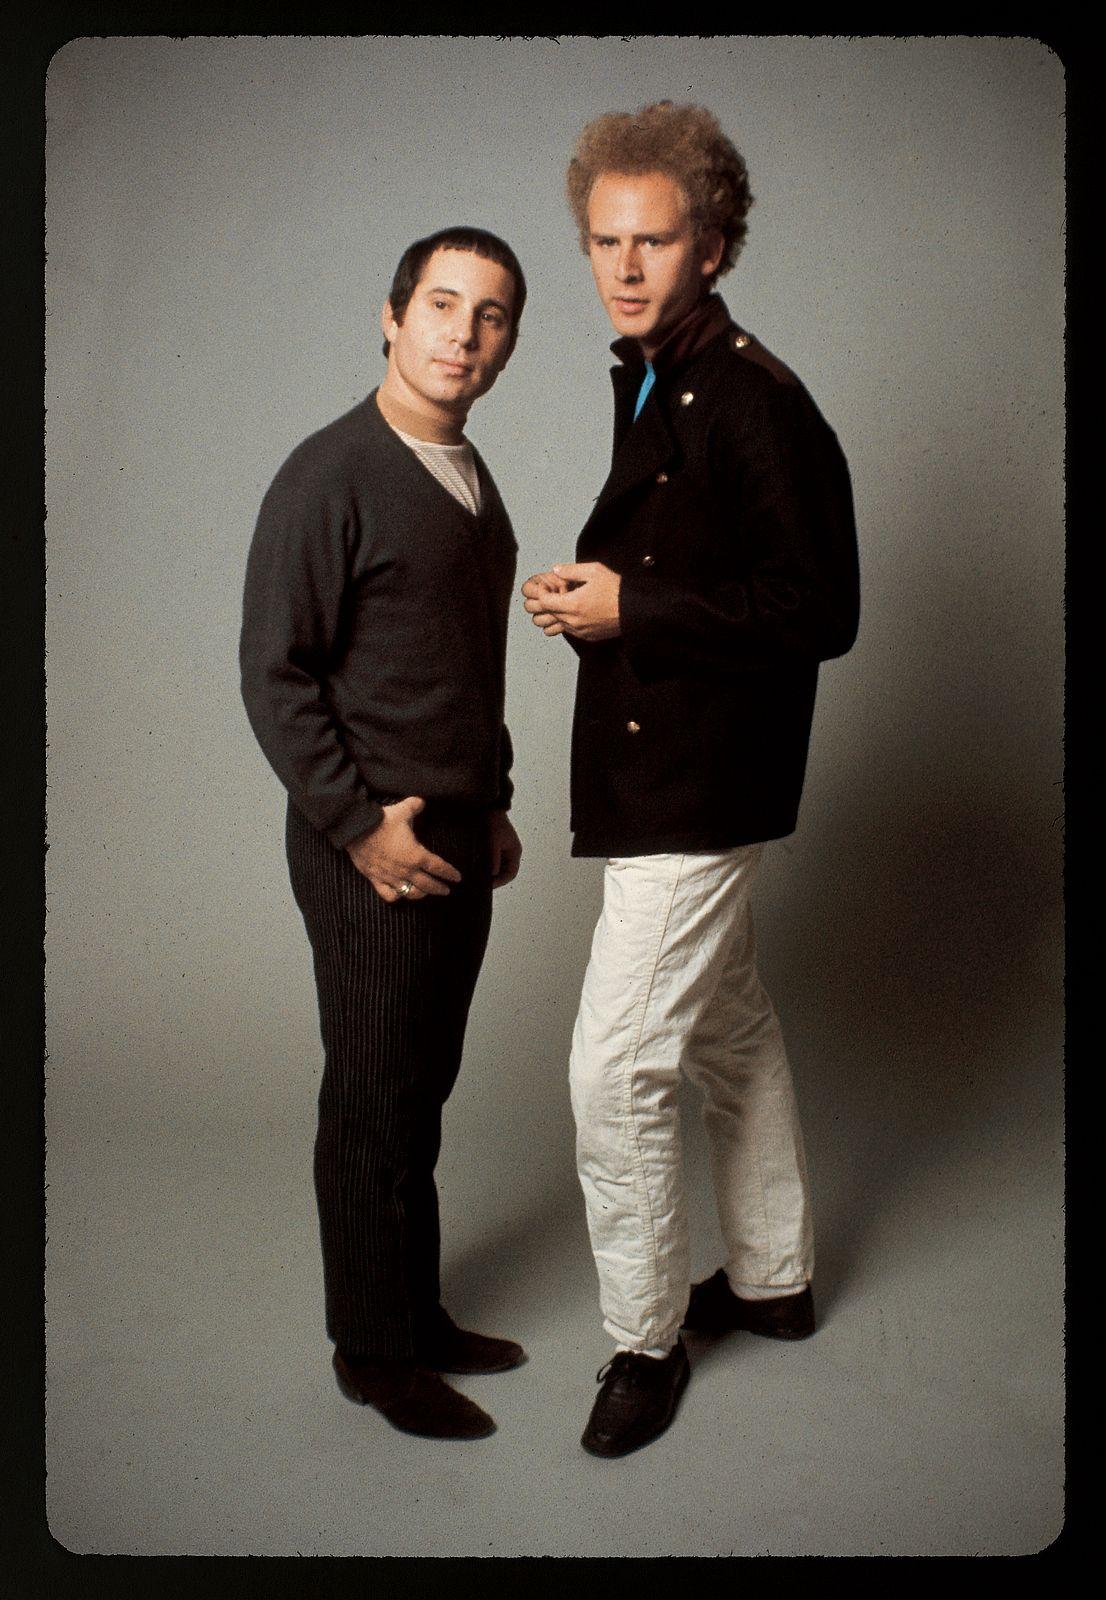 Official Photos The Official Simon & Garfunkel Site in